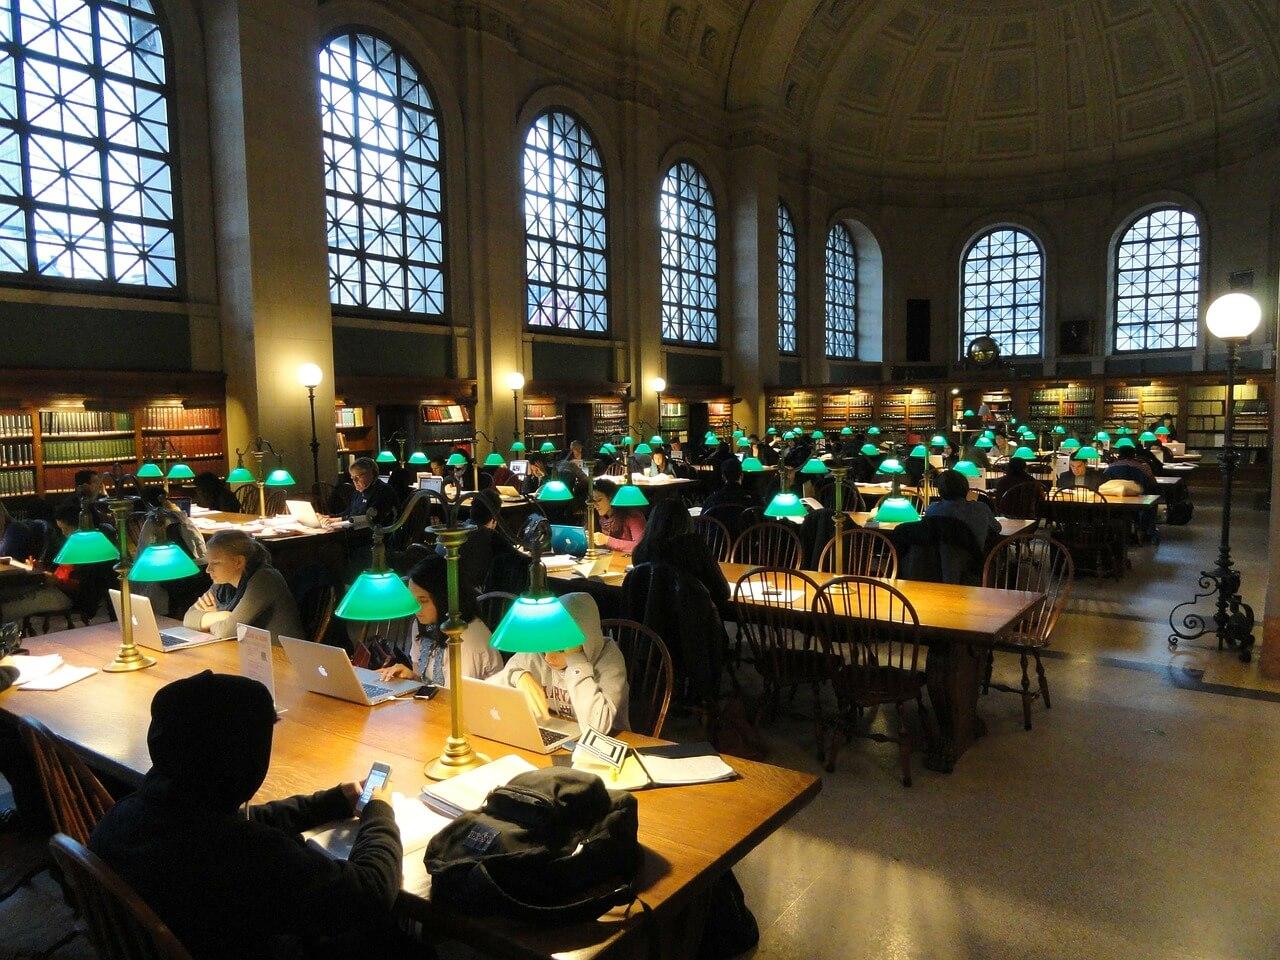 boston-public-library-85885_1280-2.jpg